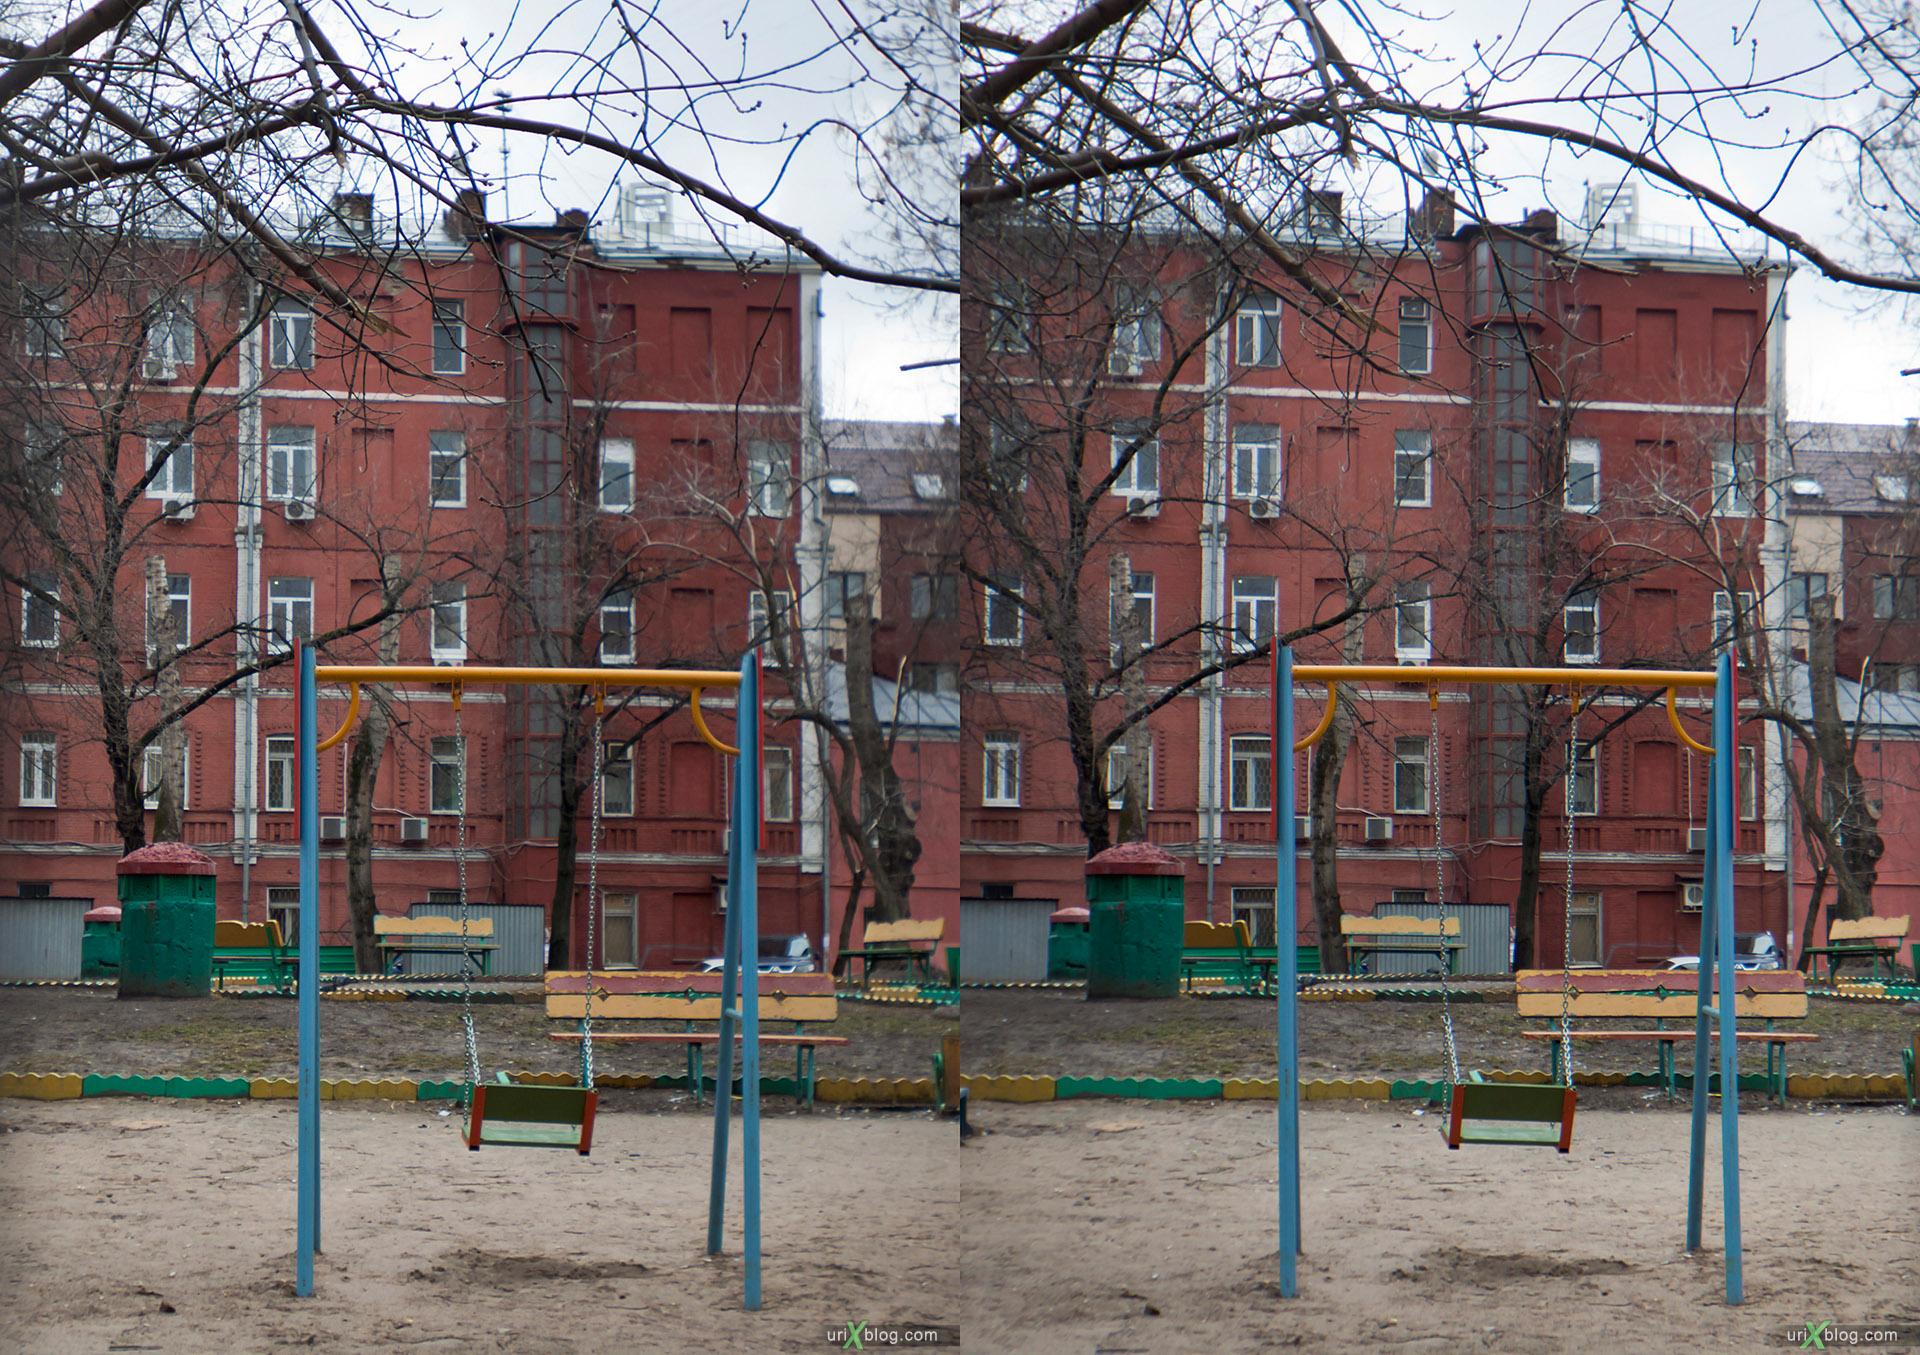 Loreo 3D lens in a cap стерео, стереопара Moscow, near the Elektrozavodskaya metro station, Москва, Электрозаводская, stereo, стерео, cross-eyed, 3D